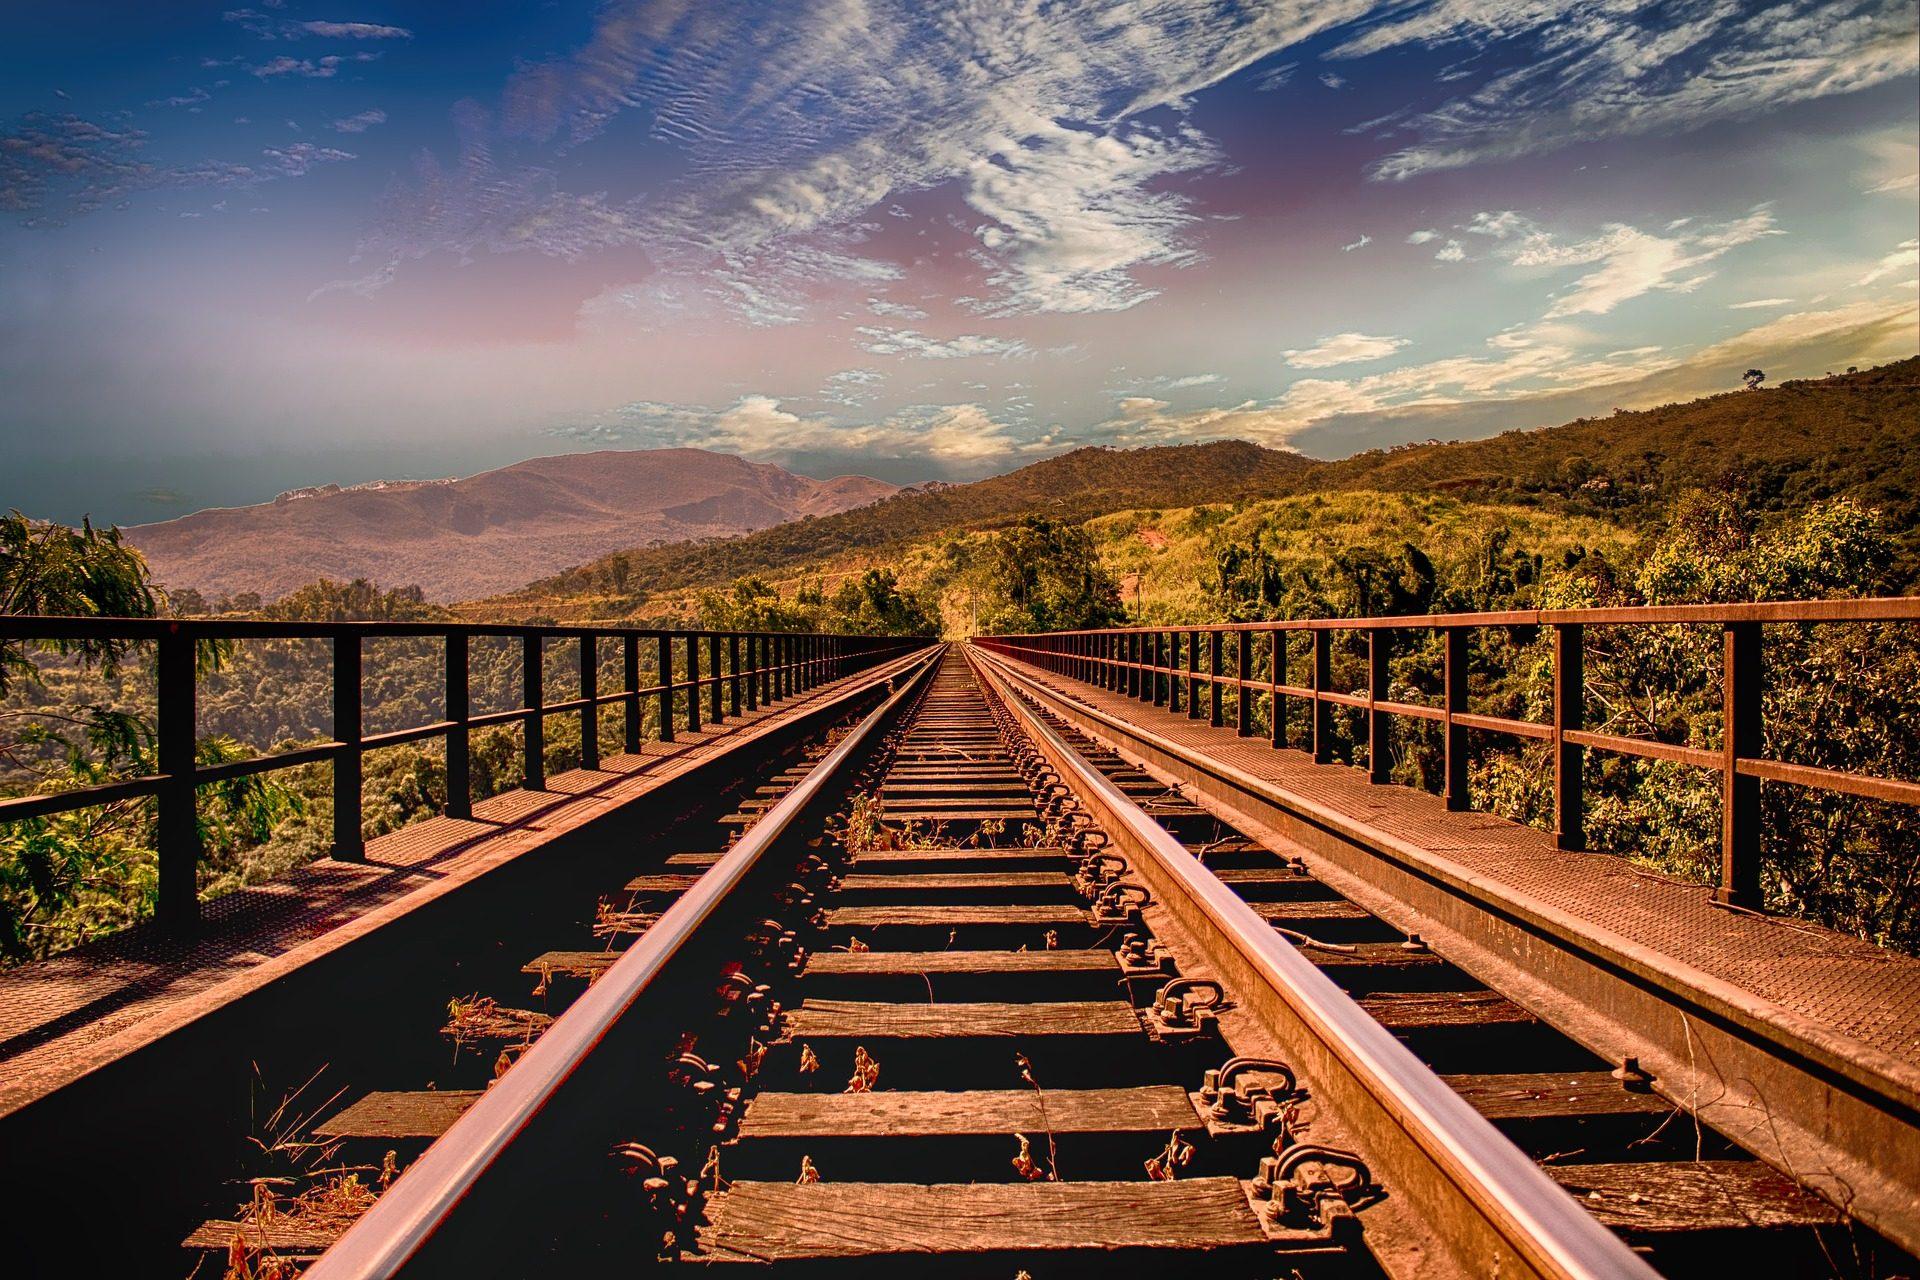 Wege, Straße, Zug, Eisenbahn, Montañas, Himmel - Wallpaper HD - Prof.-falken.com